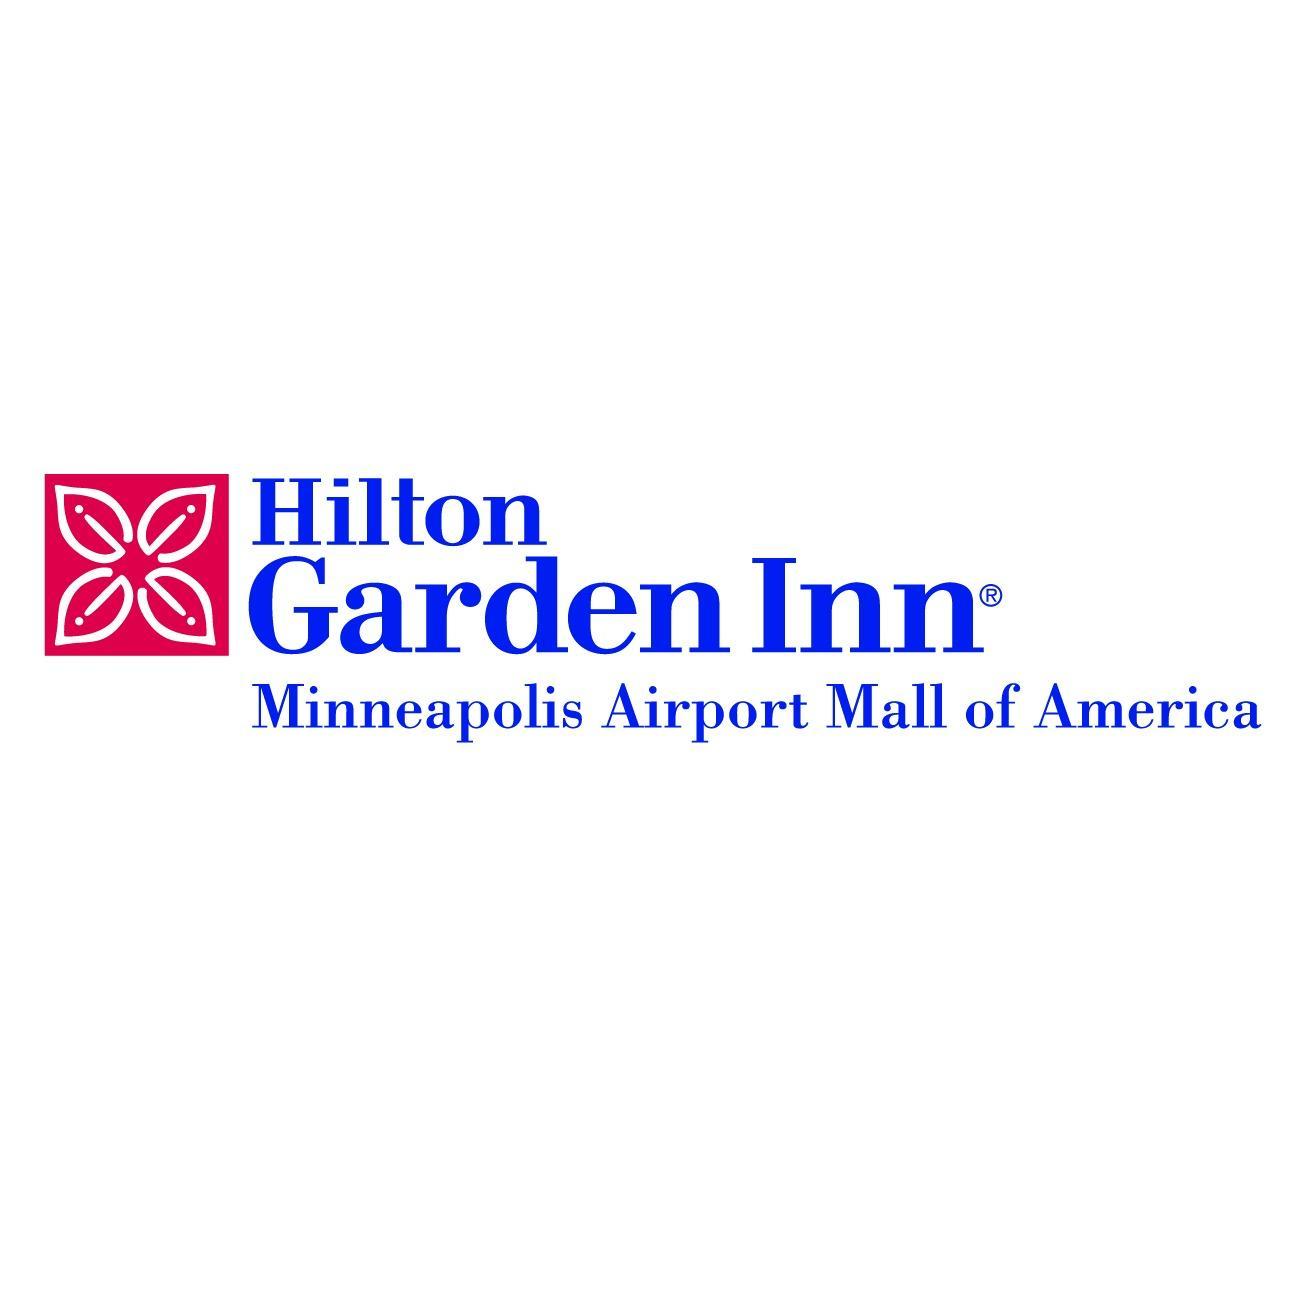 Hilton Garden Inn Minneapolis Airport Mall of America - Bloomington, MN - Hotels & Motels